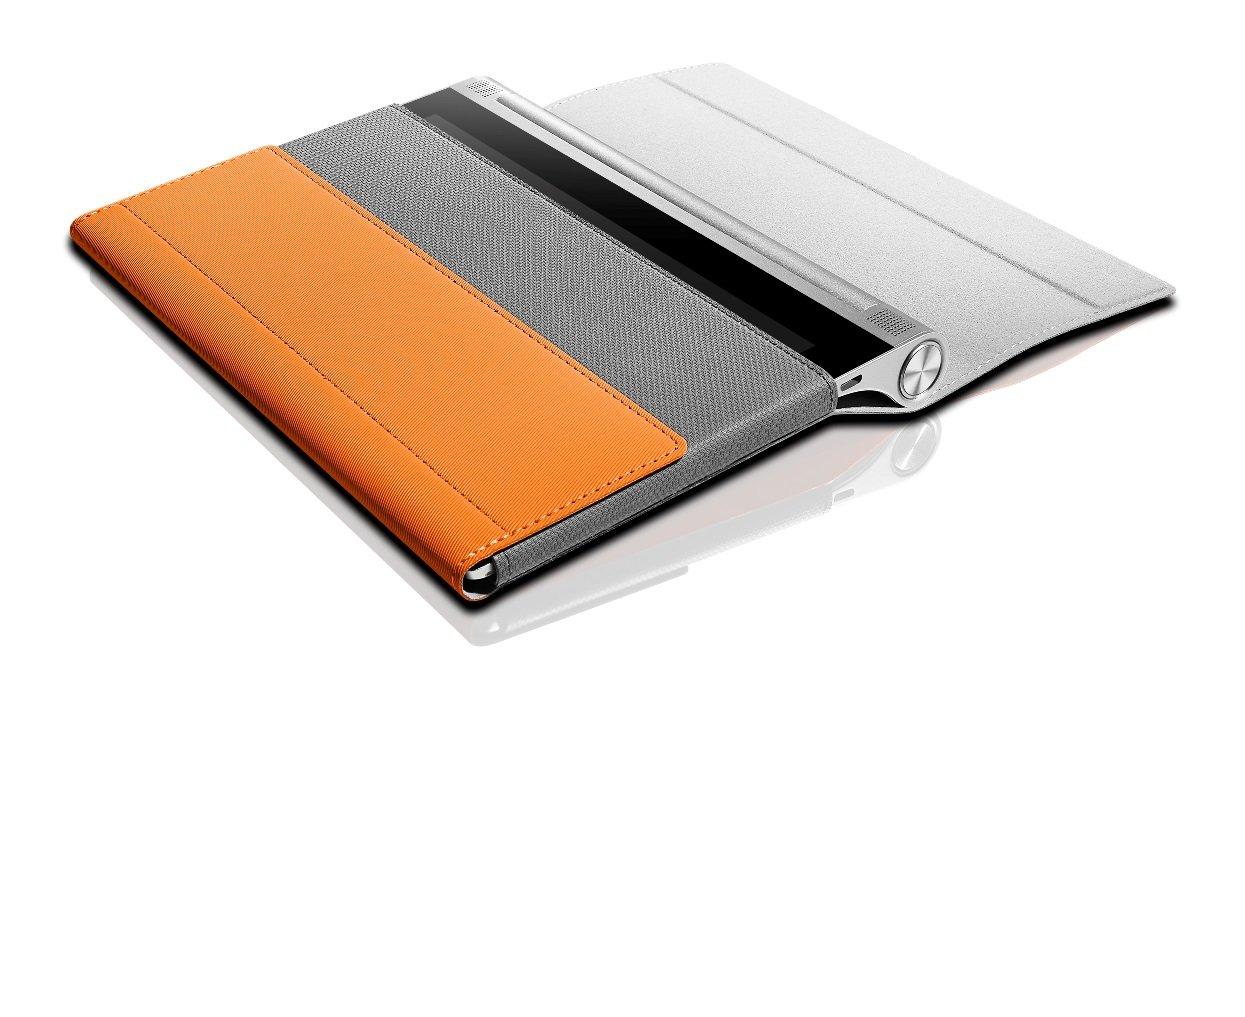 Lenovo Yoga Tablet 2 8 Sleeve And Film Orange Tab 888017182 Computers Accessories